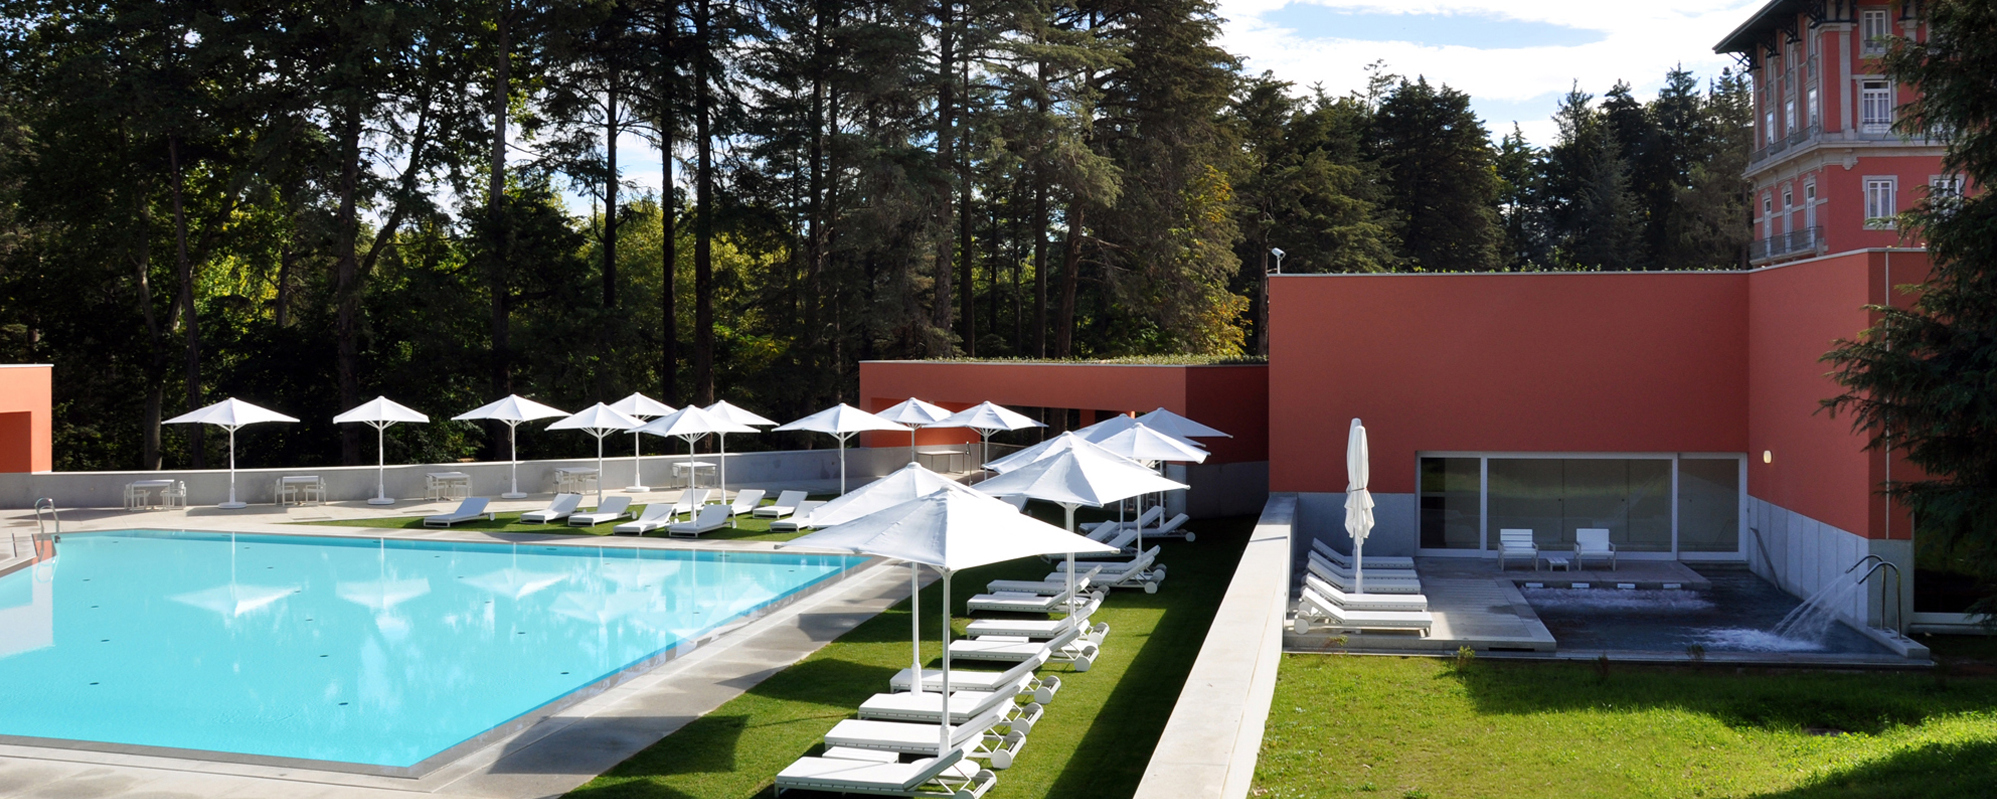 vidago-palace-swimming-pool